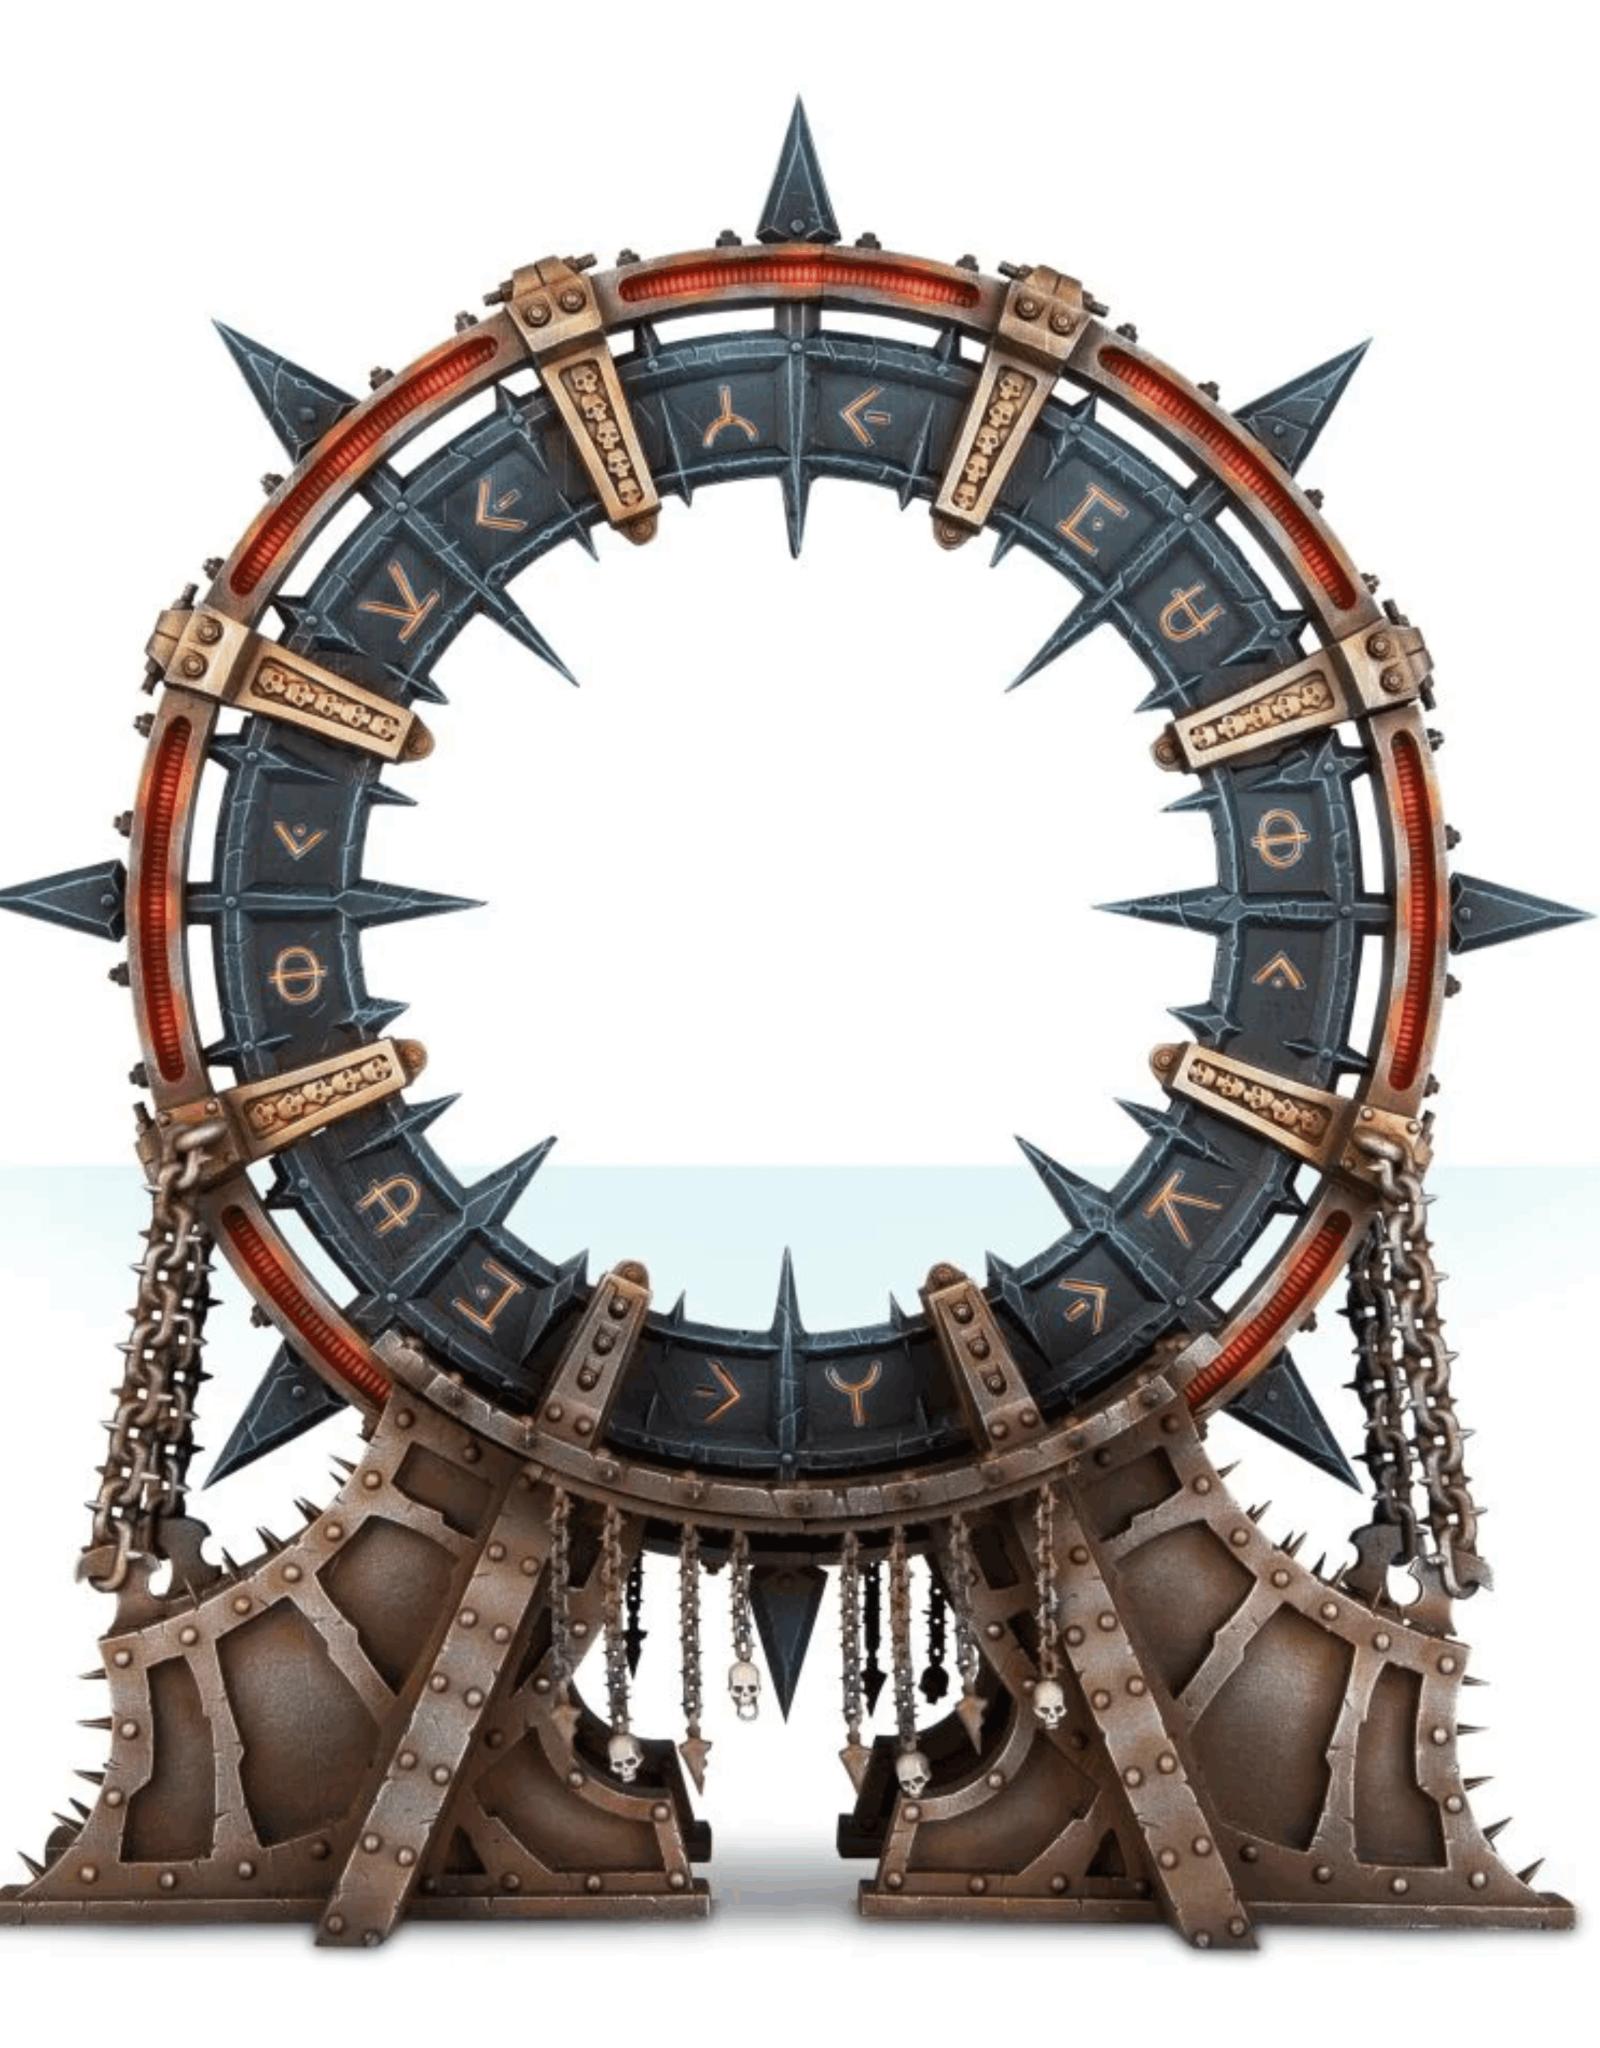 Warhammer 40k Chaos - Noctilith Crown